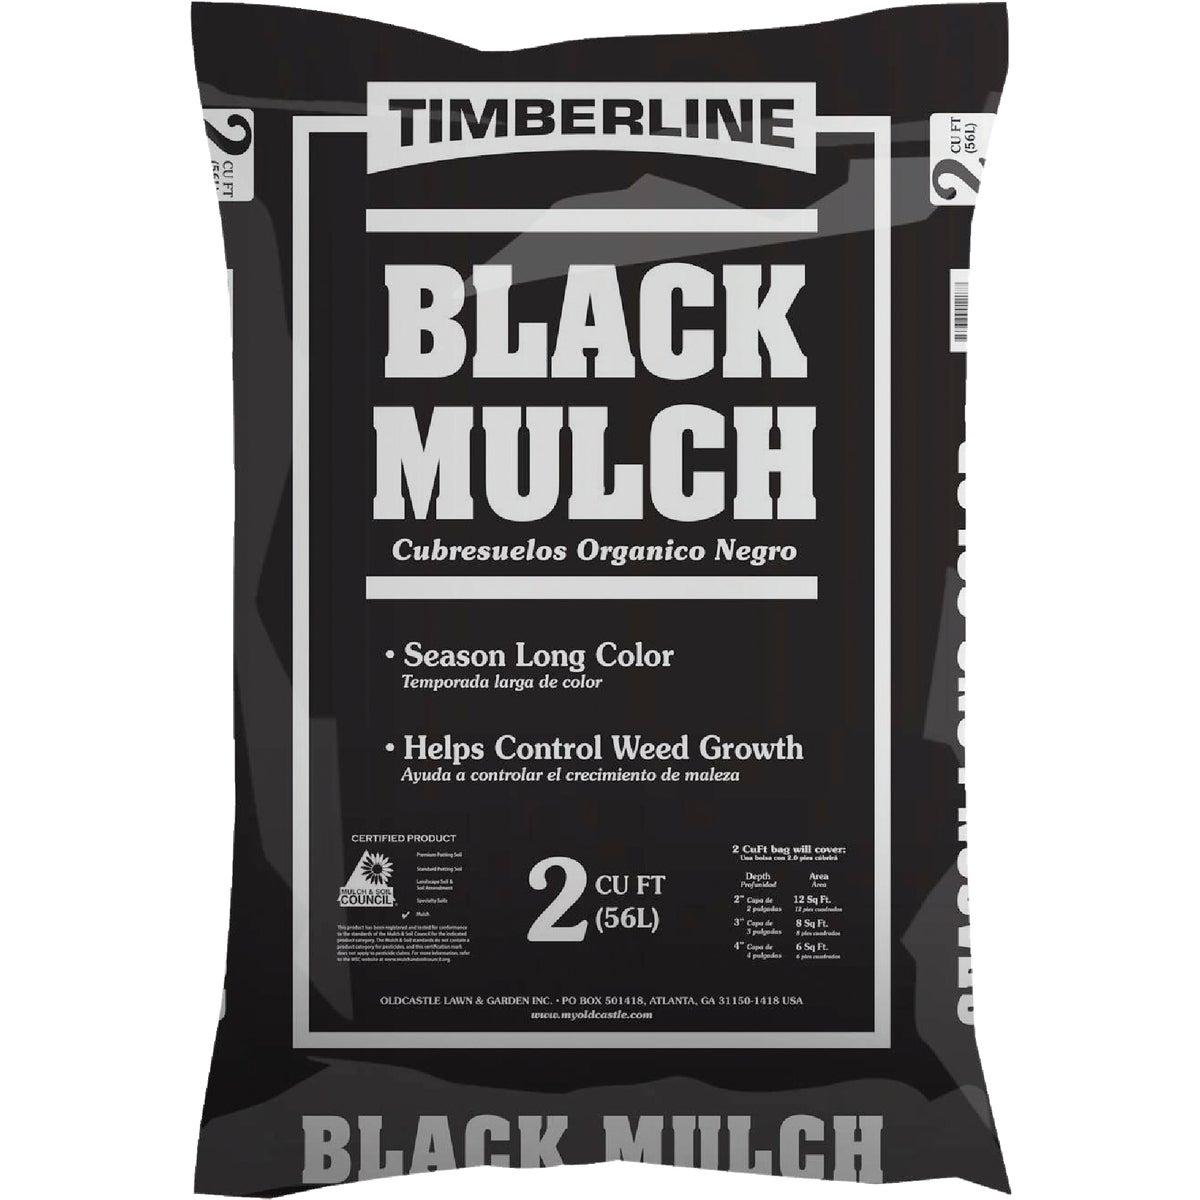 2CF BLACK SHREDDED MULCH - 52058058 by Old Castle Retail